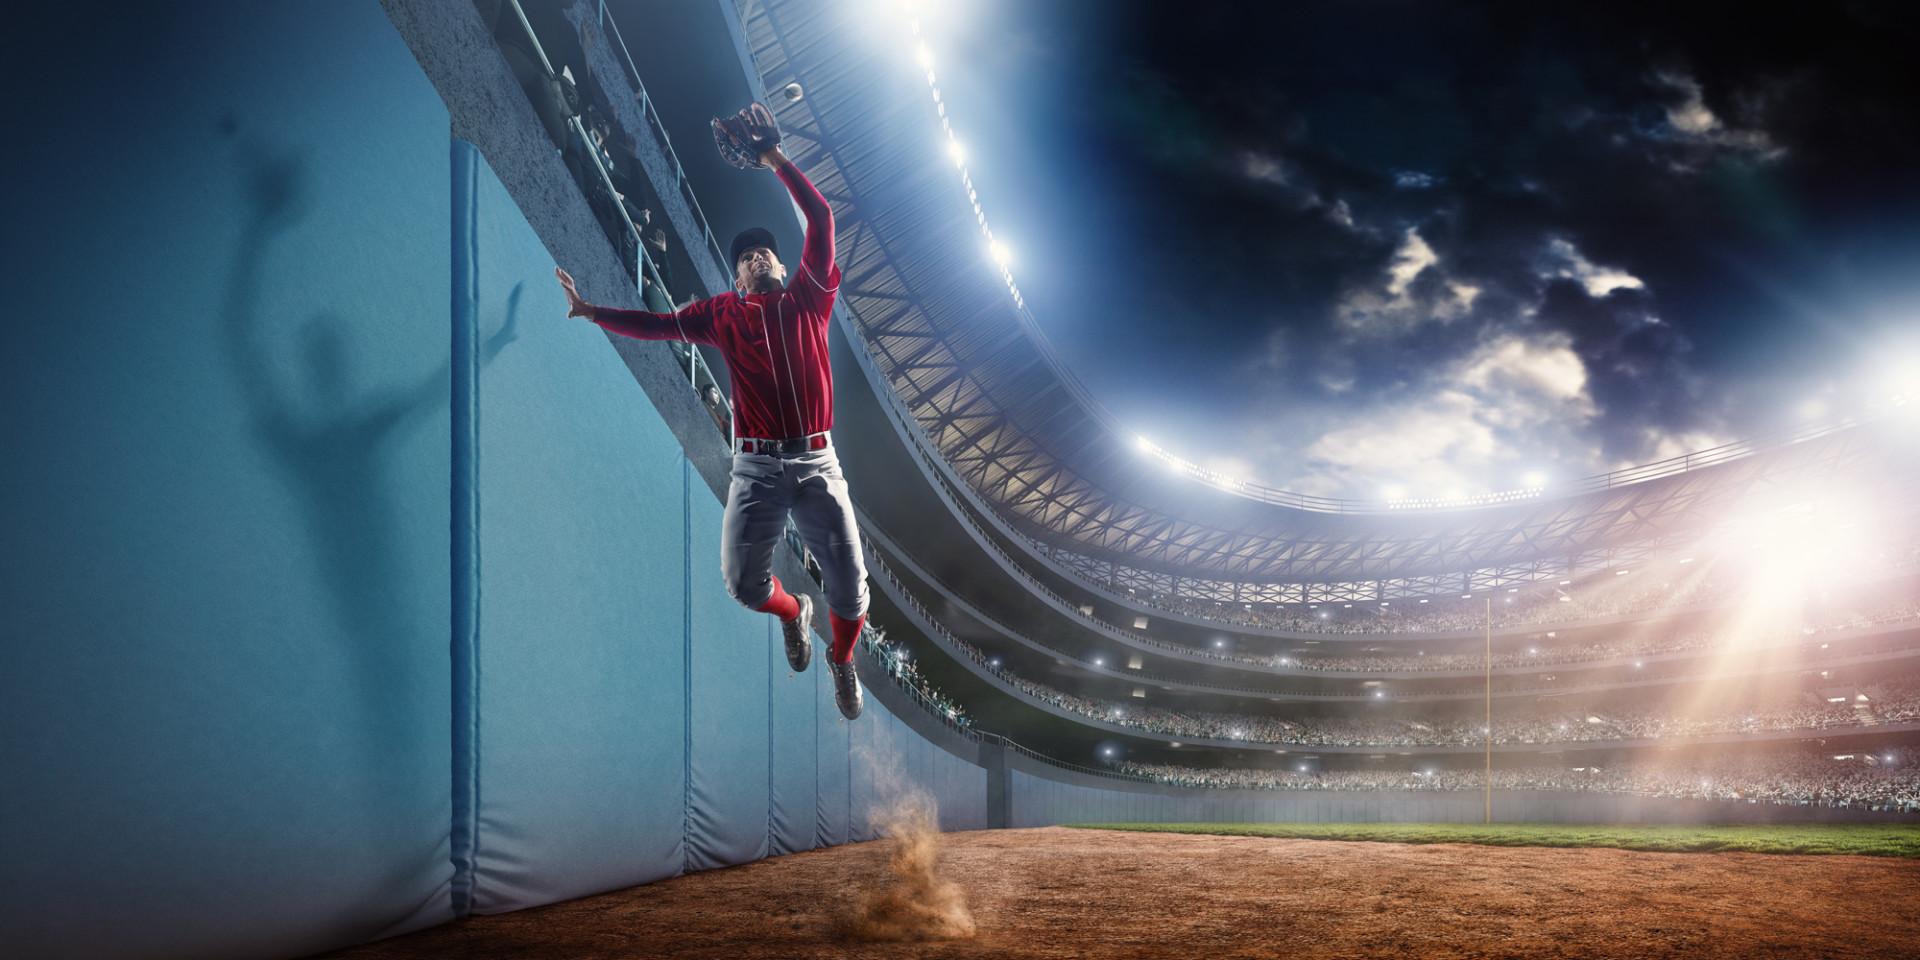 23_03_2016_baseball_game_007-1920x960